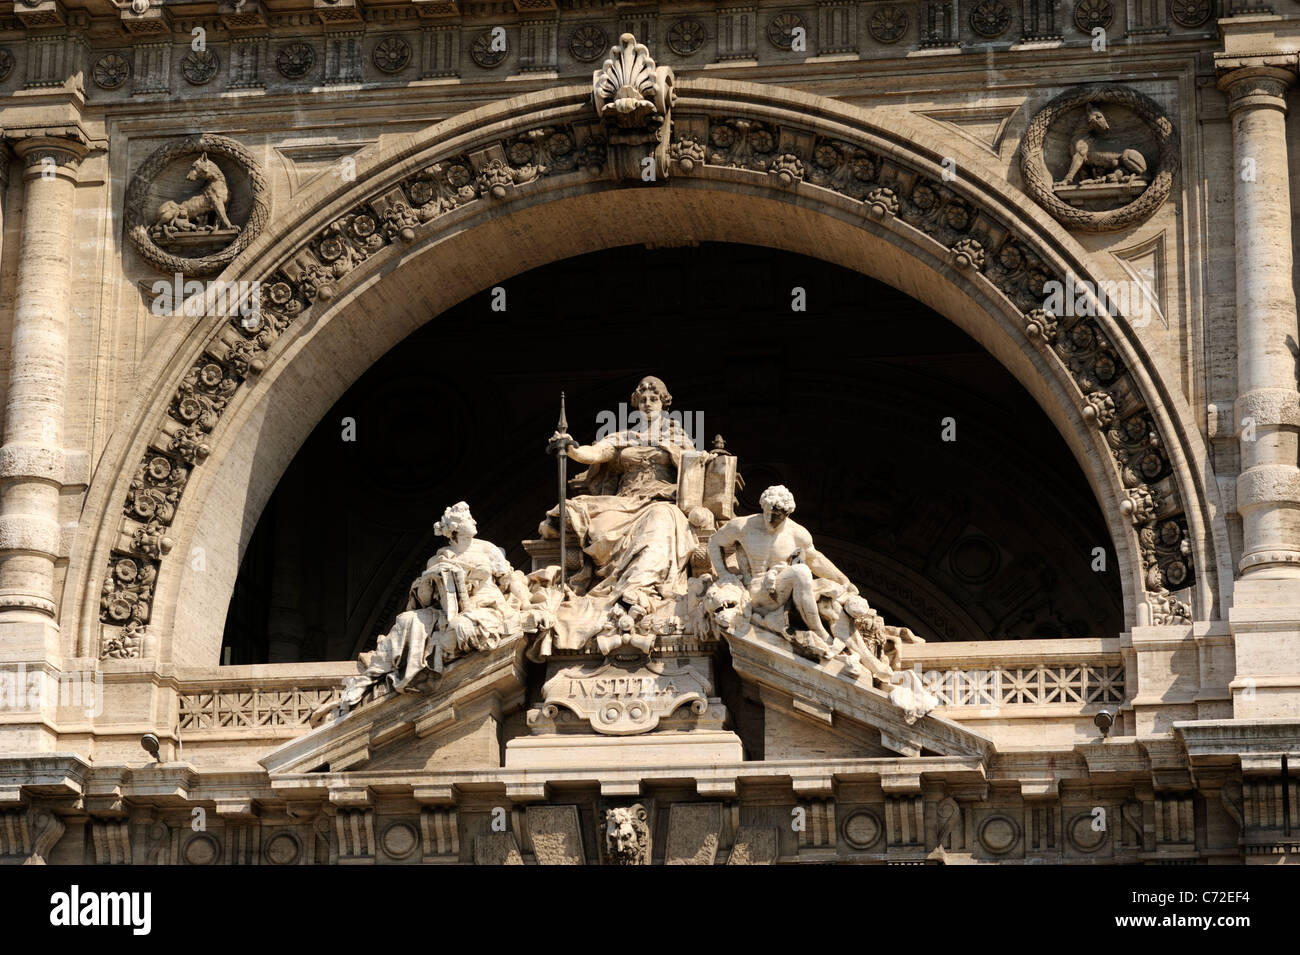 italy, rome, palazzo di giustizia, palace of justice - Stock Image